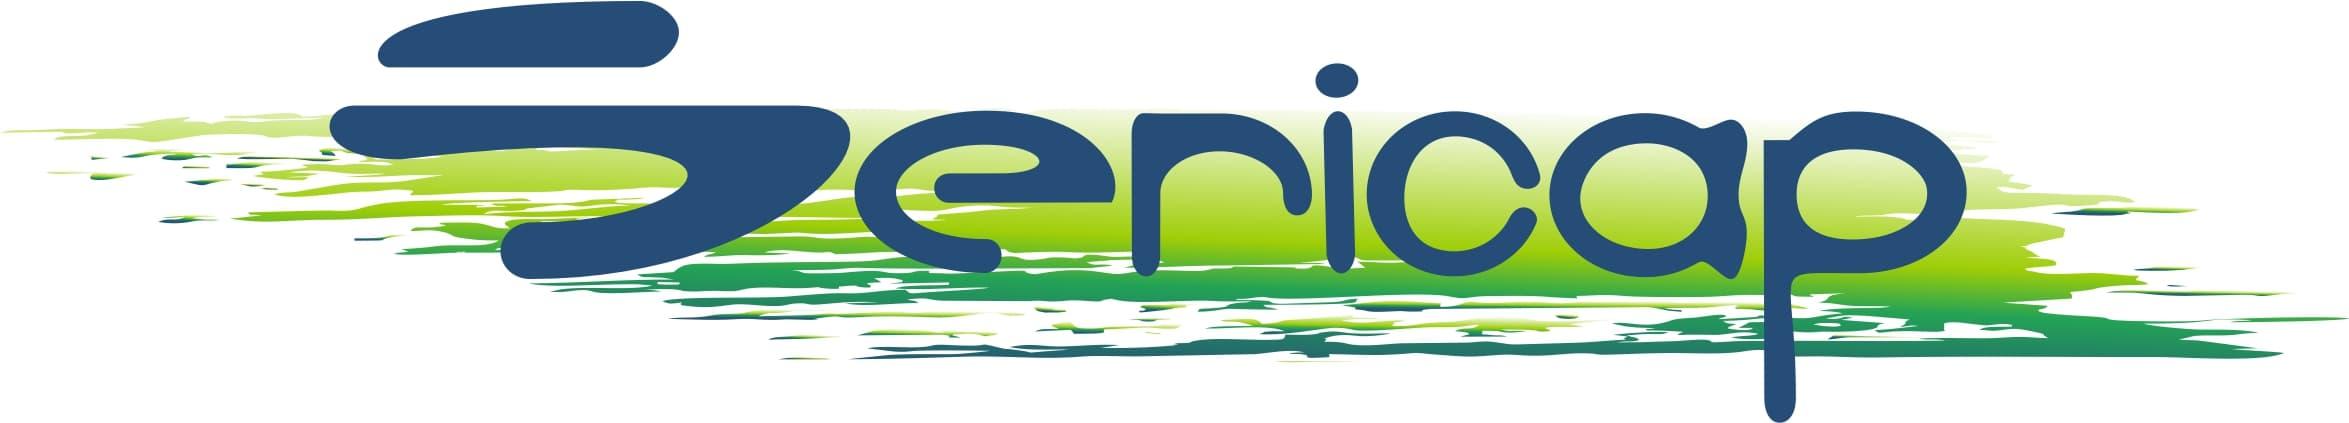 Sericap serigrafia e stampa digitale logo